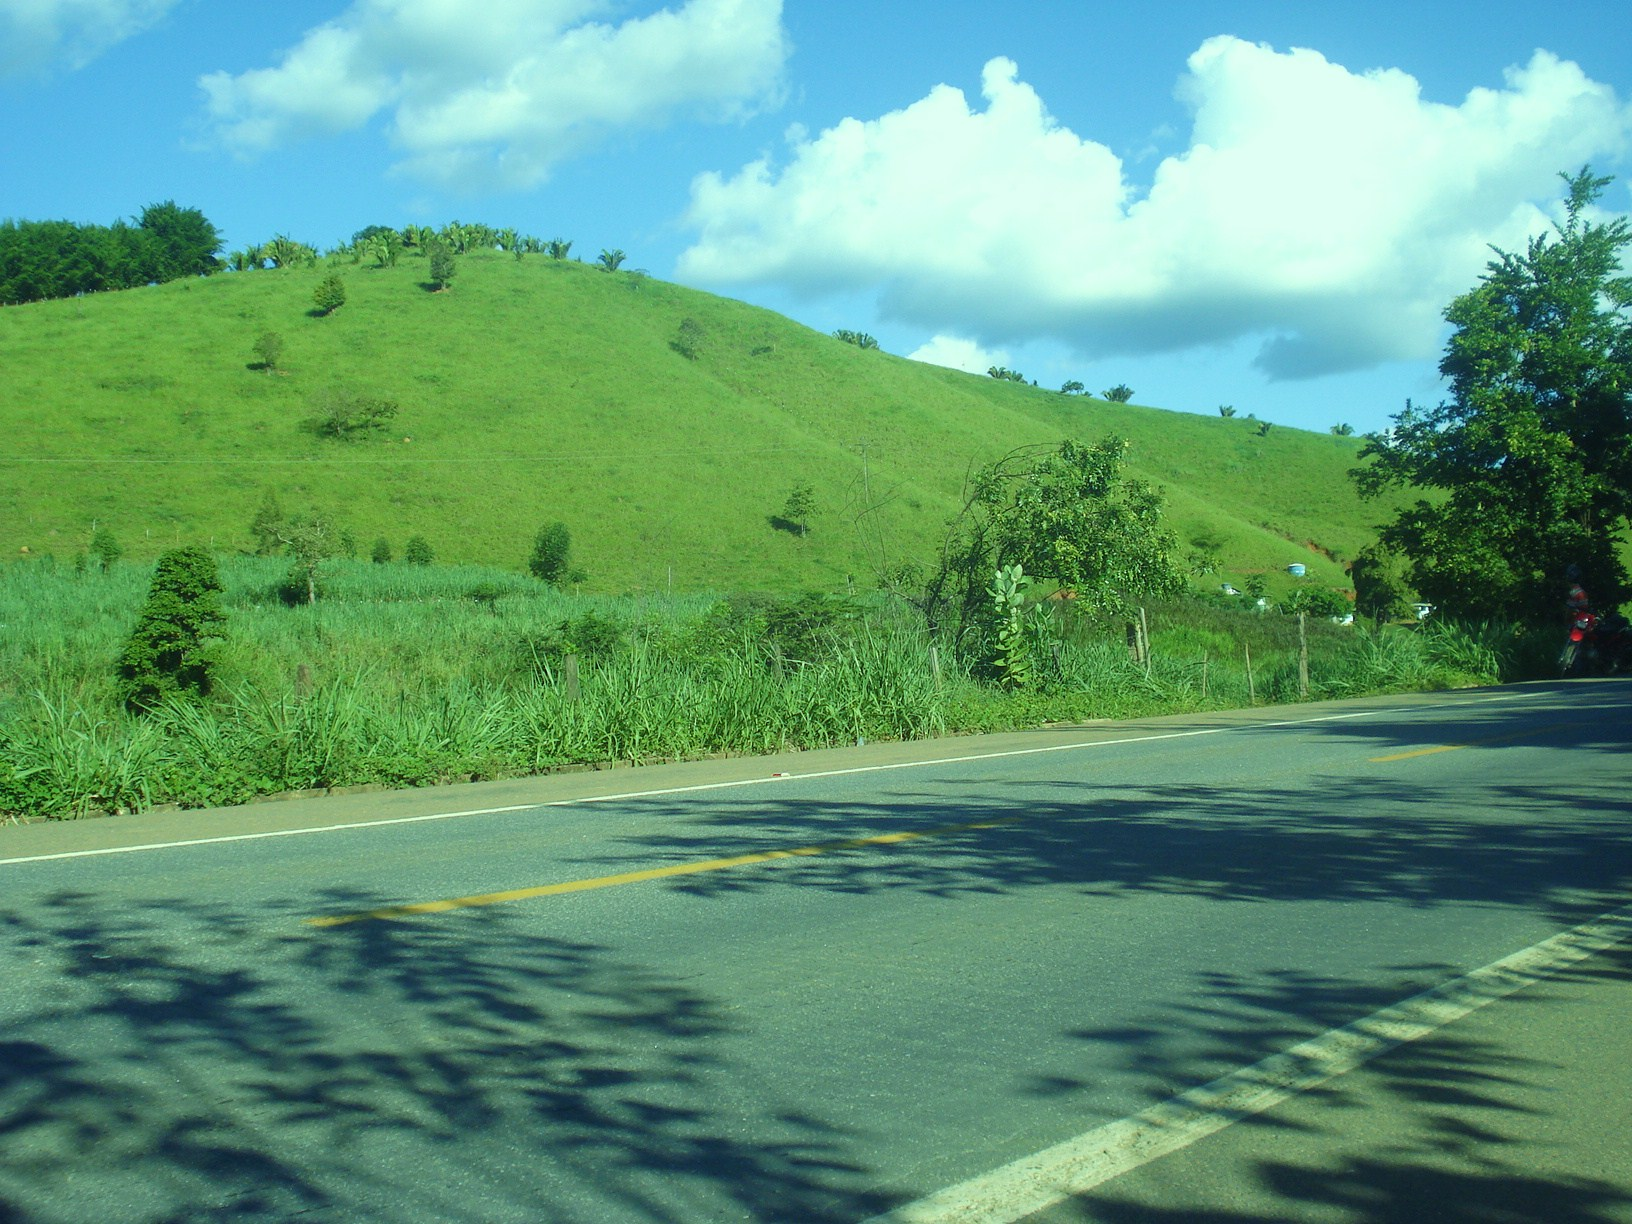 Estrada e campo ao fundo